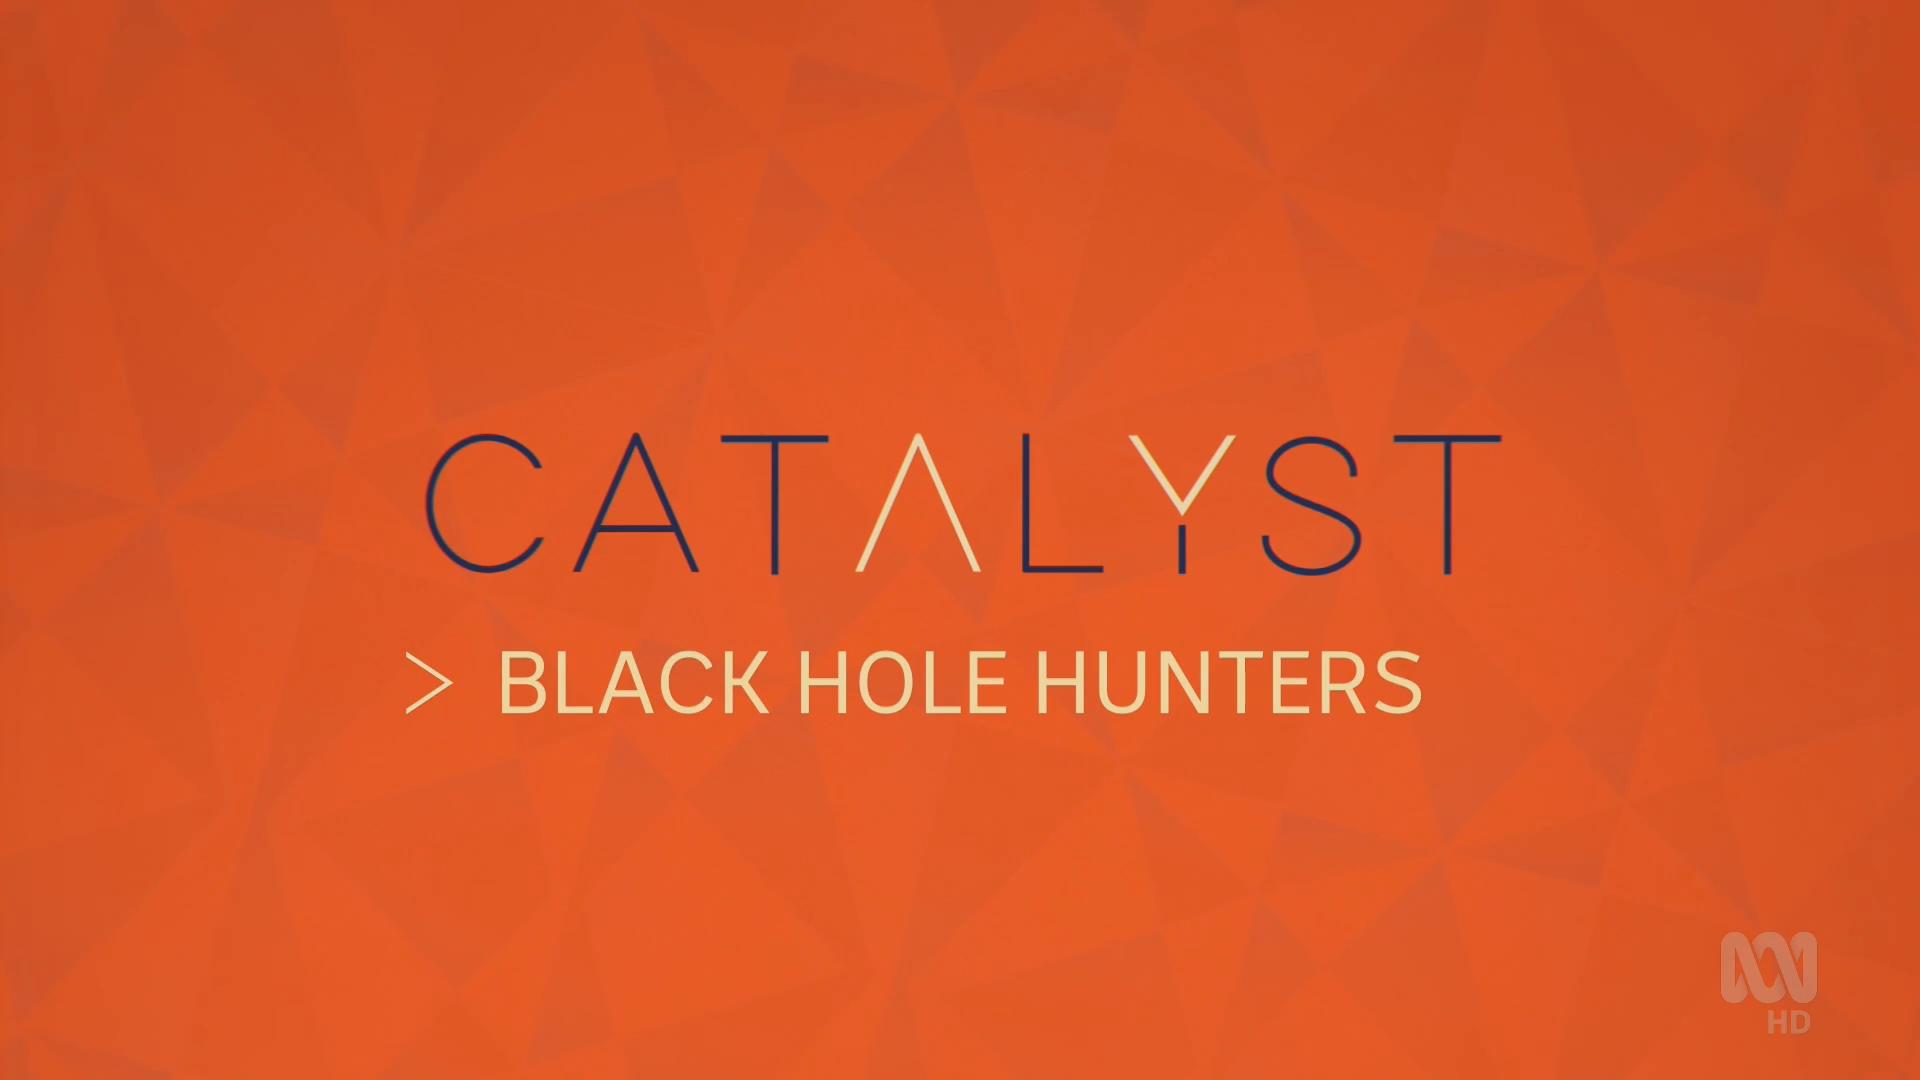 ABC - Catalyst: Black Hole Hunters (2019)